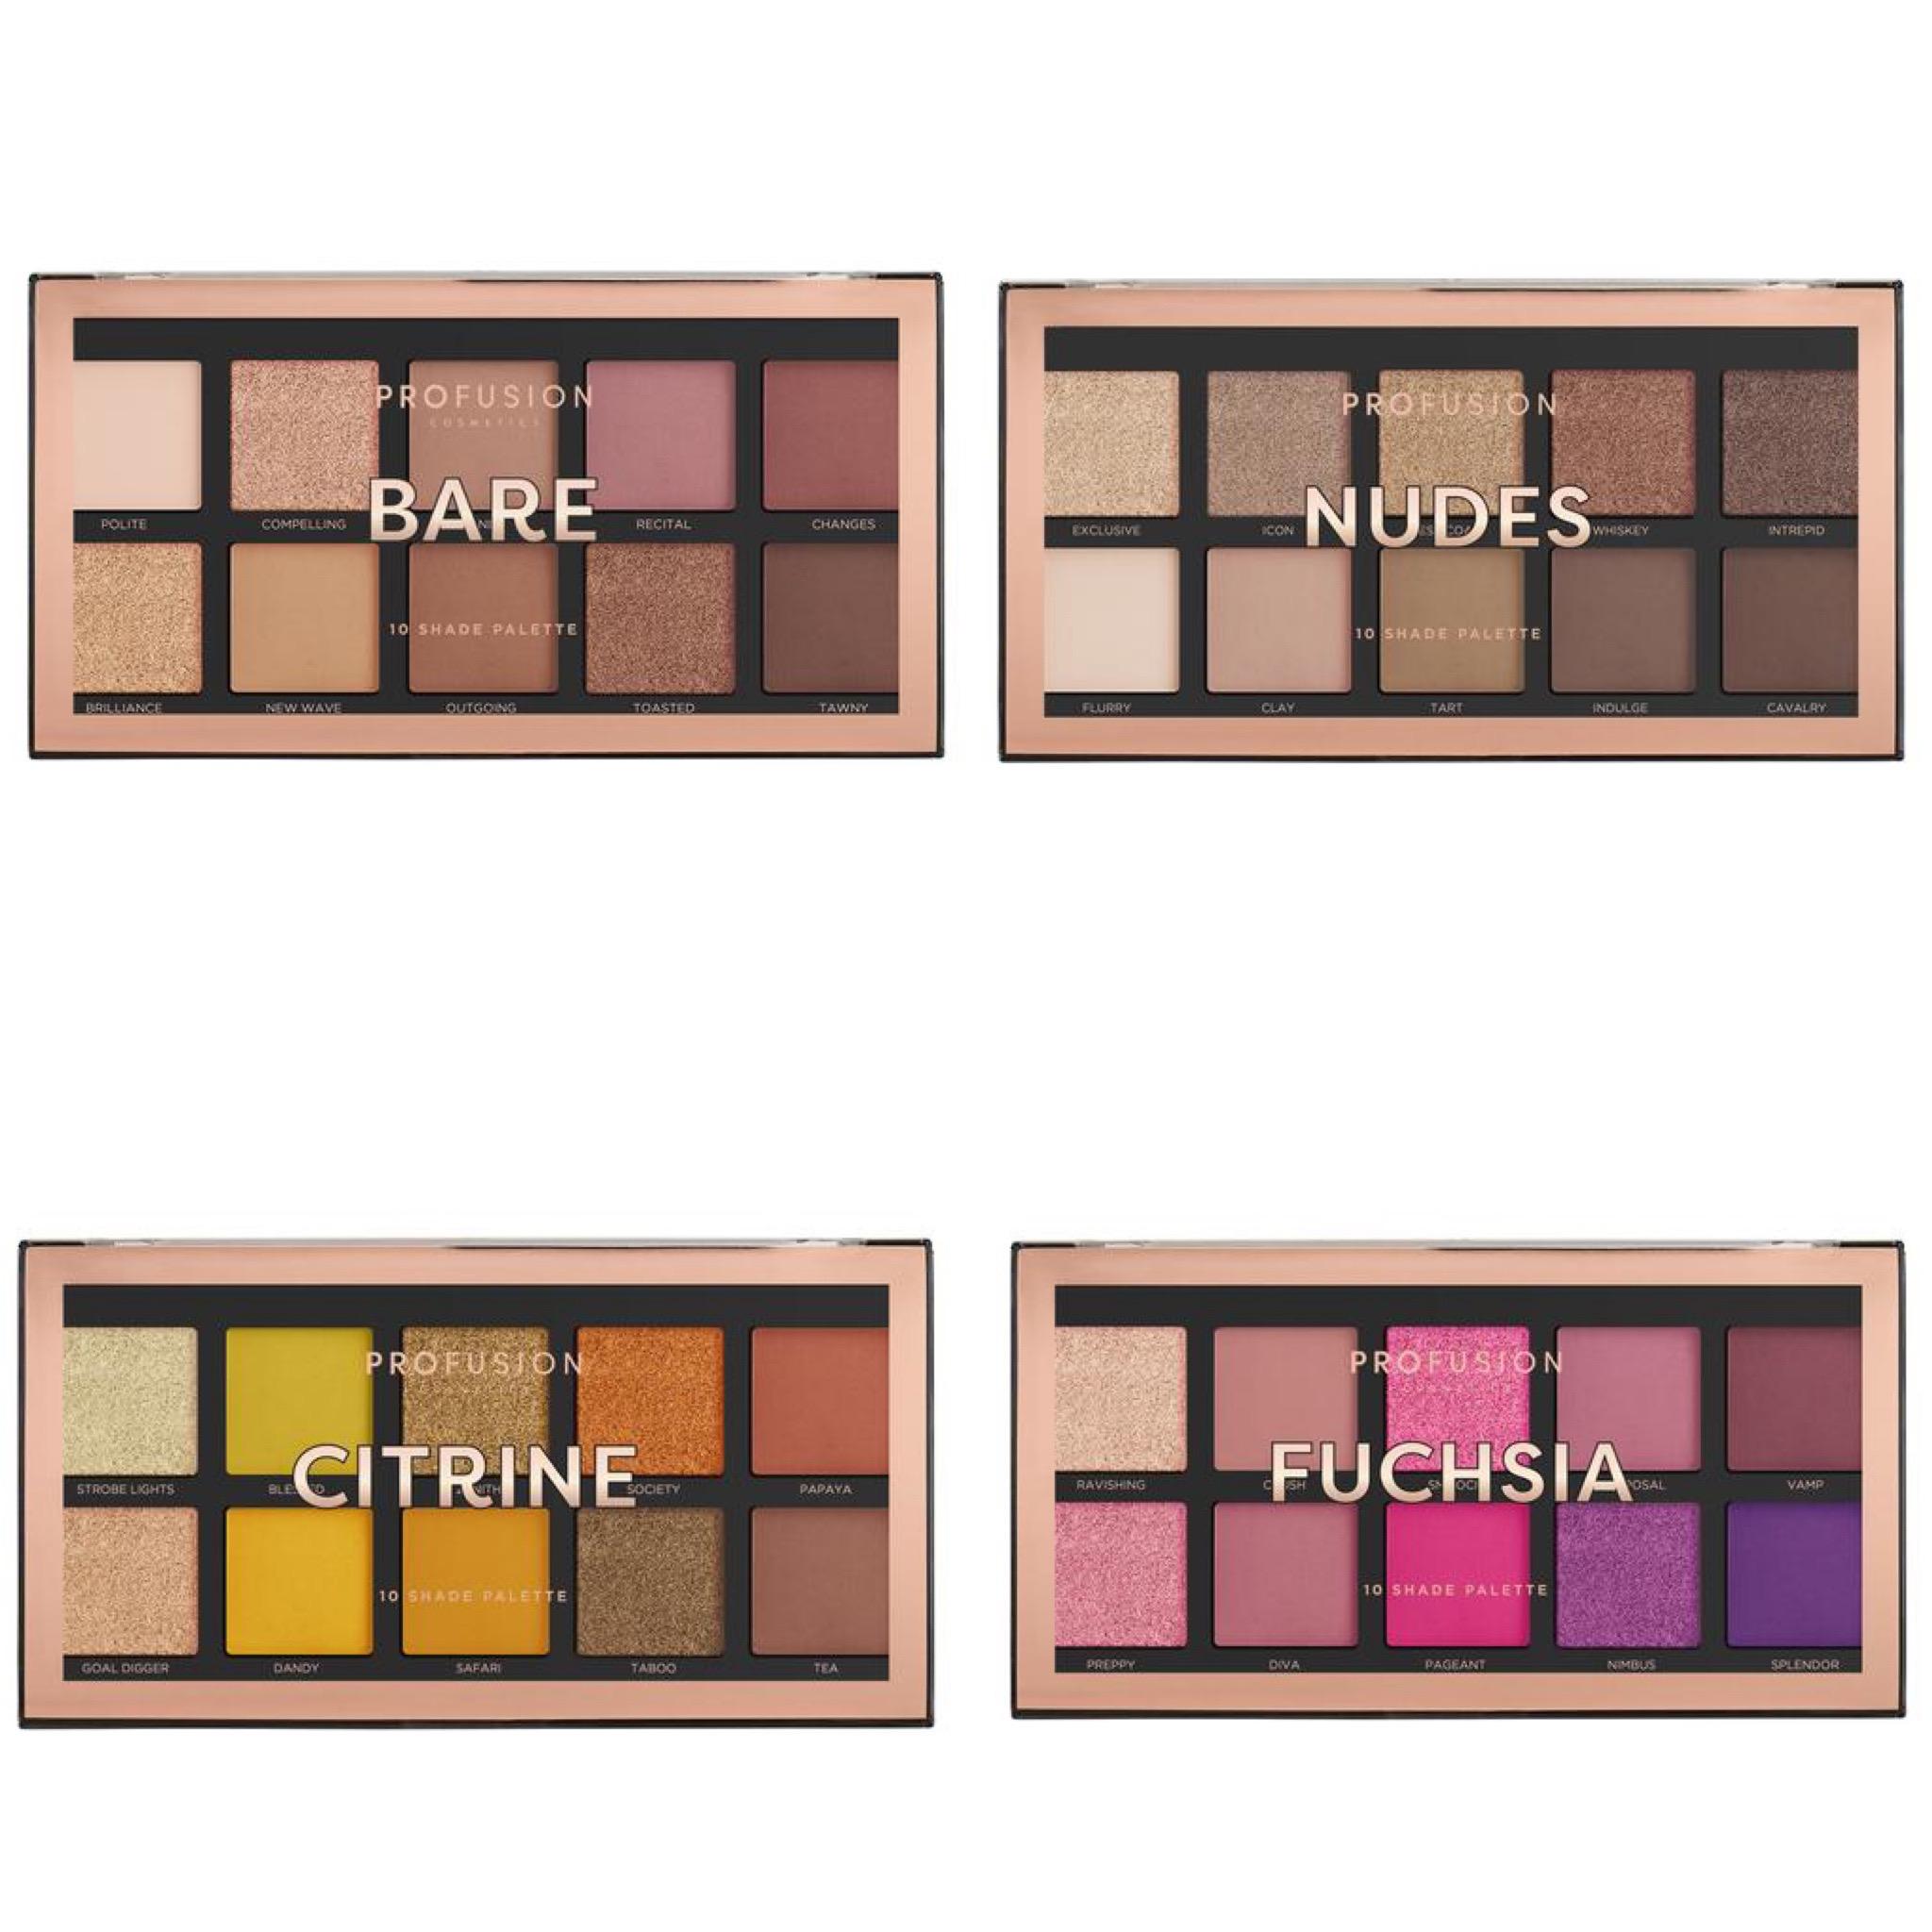 Profusion Cosmetics 10 Shade Palette